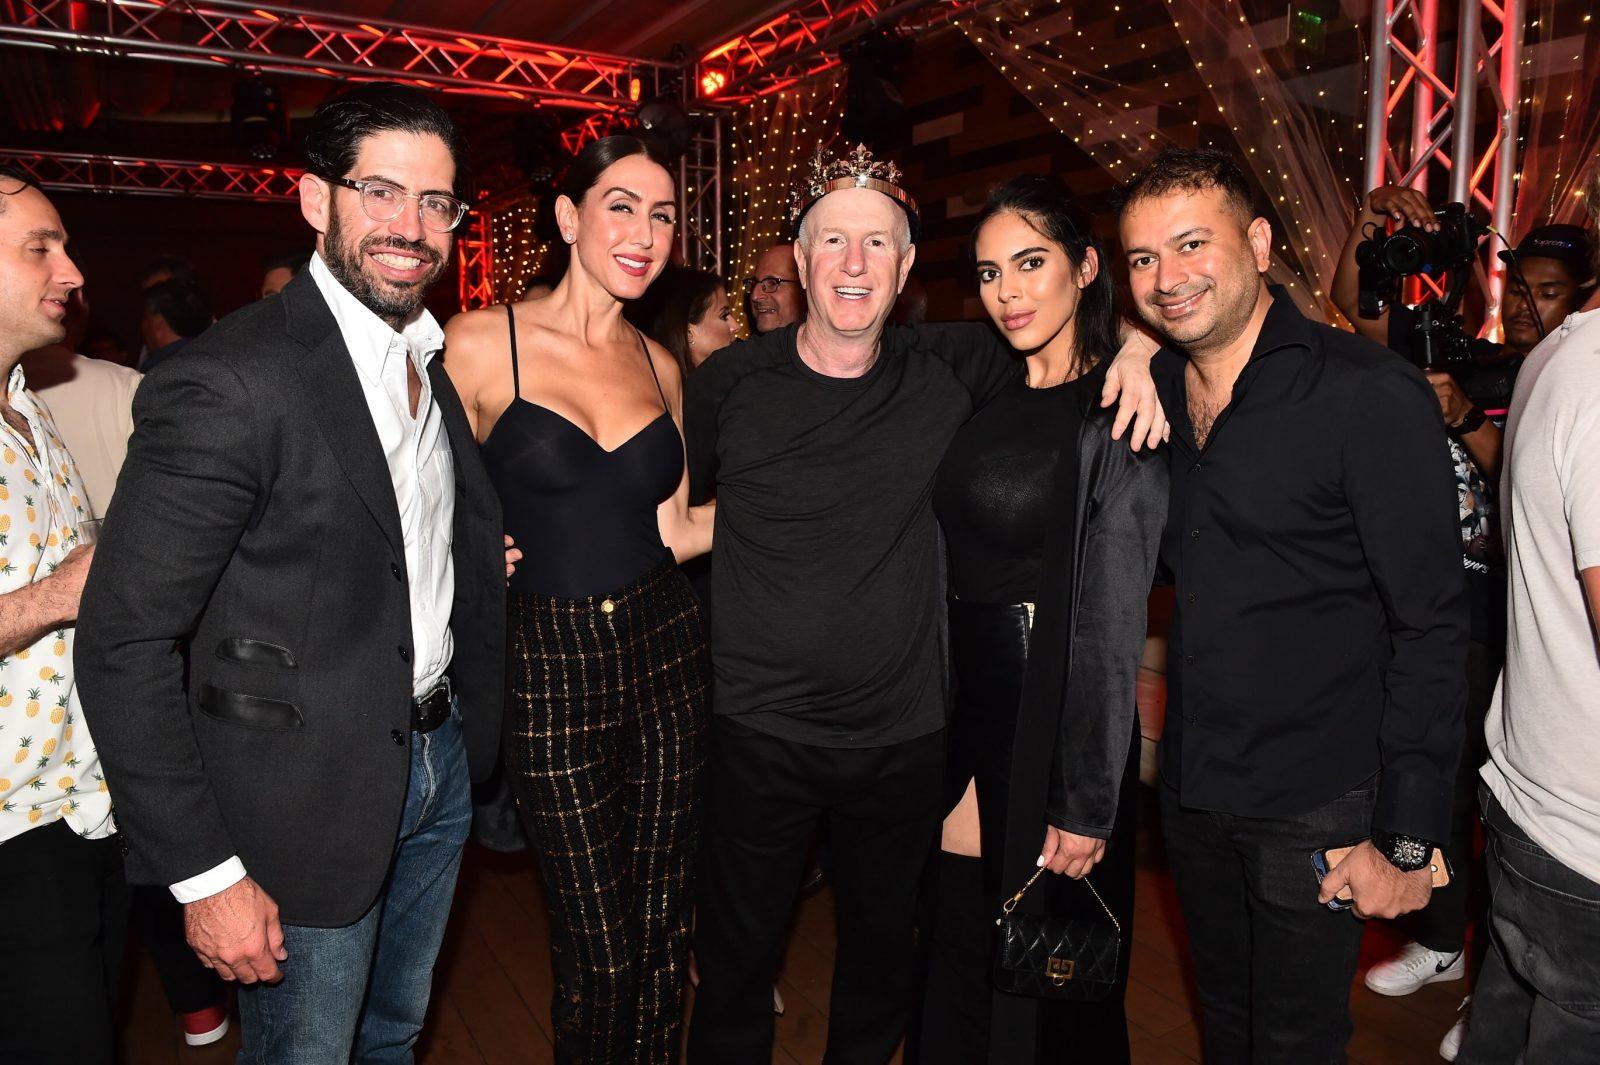 David Martin, Christy Martin, Marc Roberts, Deyvanshi Masrani, Kamal Hotchandani